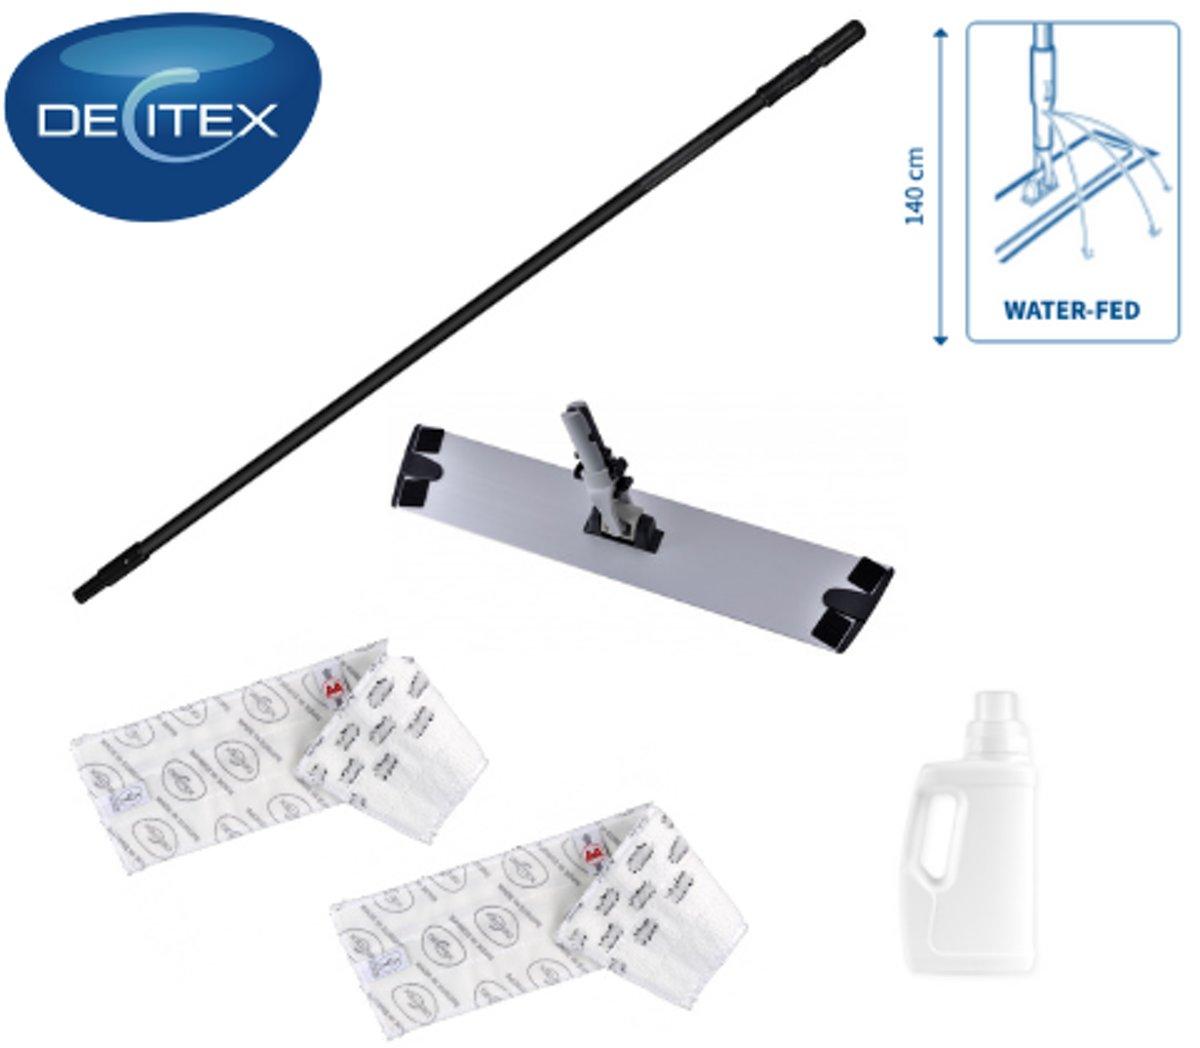 Decitex Professionele Dweilset - Zwart - Microvezel kopen